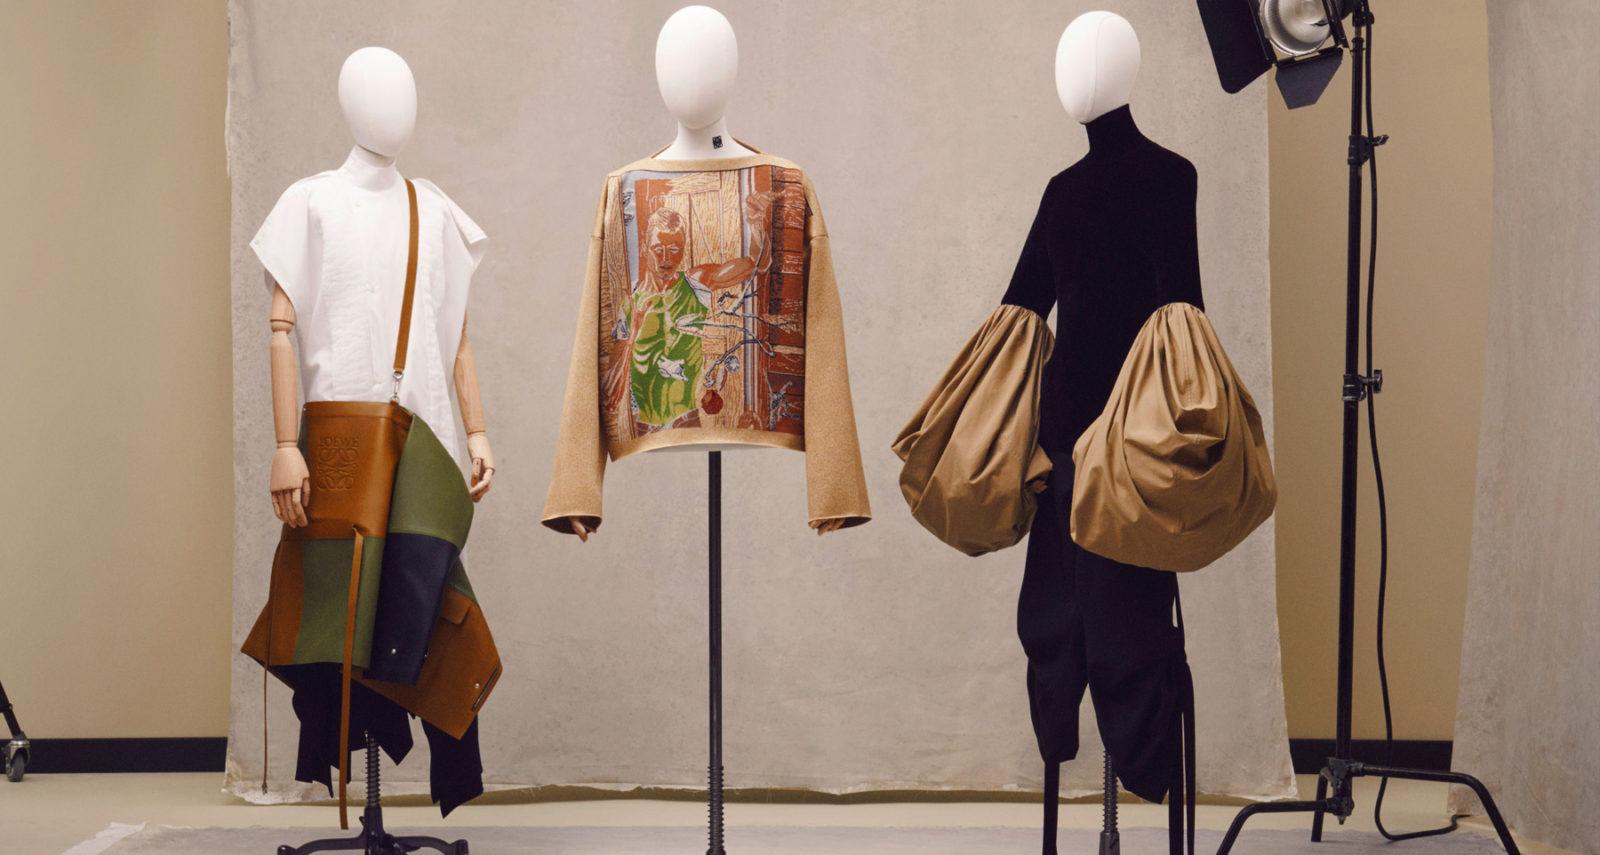 Paris Men S Fashion Week Spring Summer 2021 The Most Innovative Online Presentations